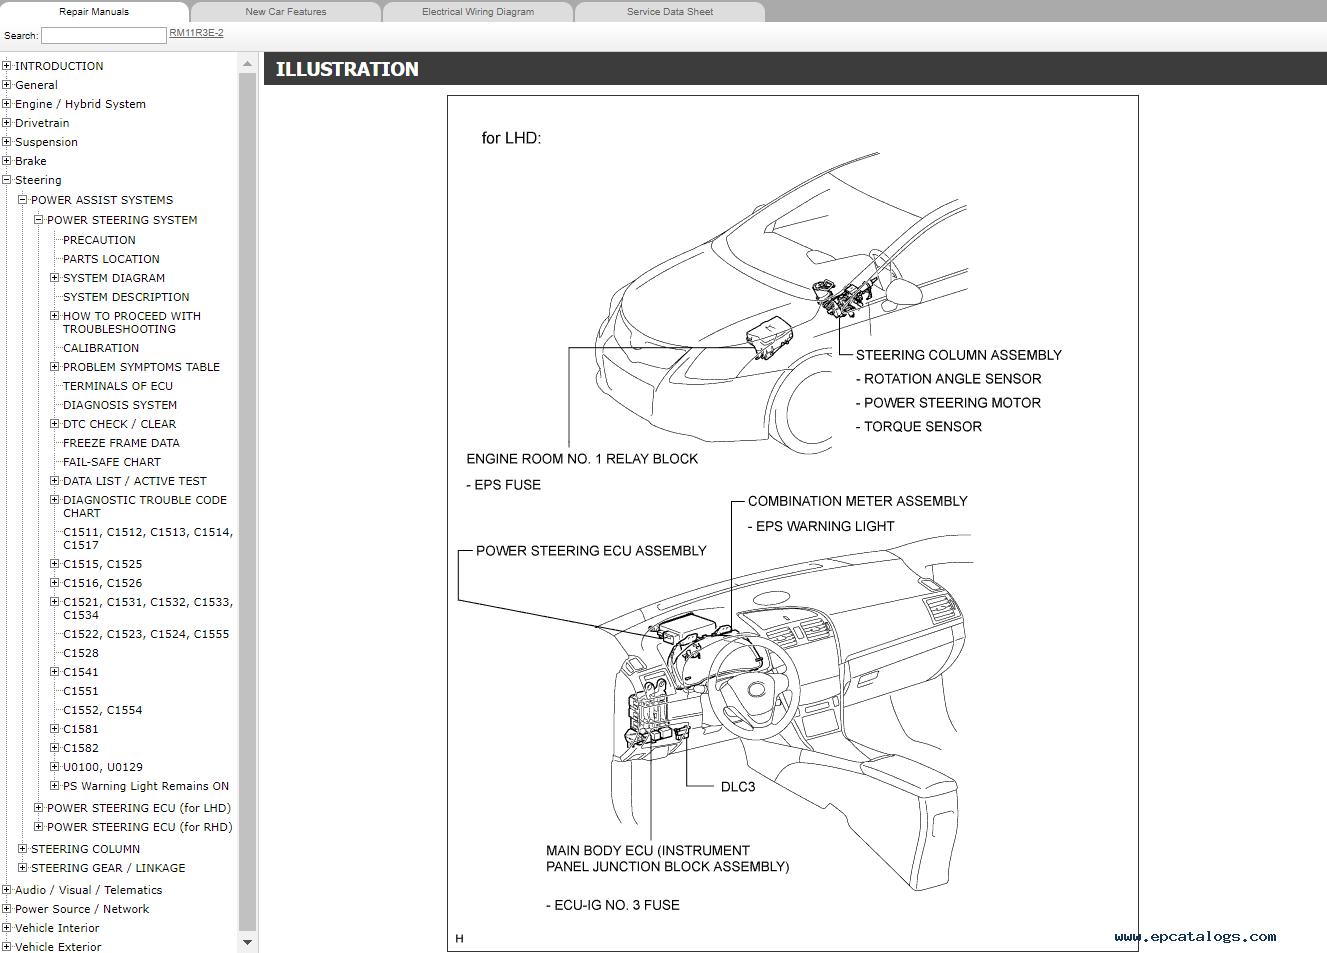 hight resolution of repair manual toyota avensis petrol azt270 zrt270 271 272 repair manual rm11r3